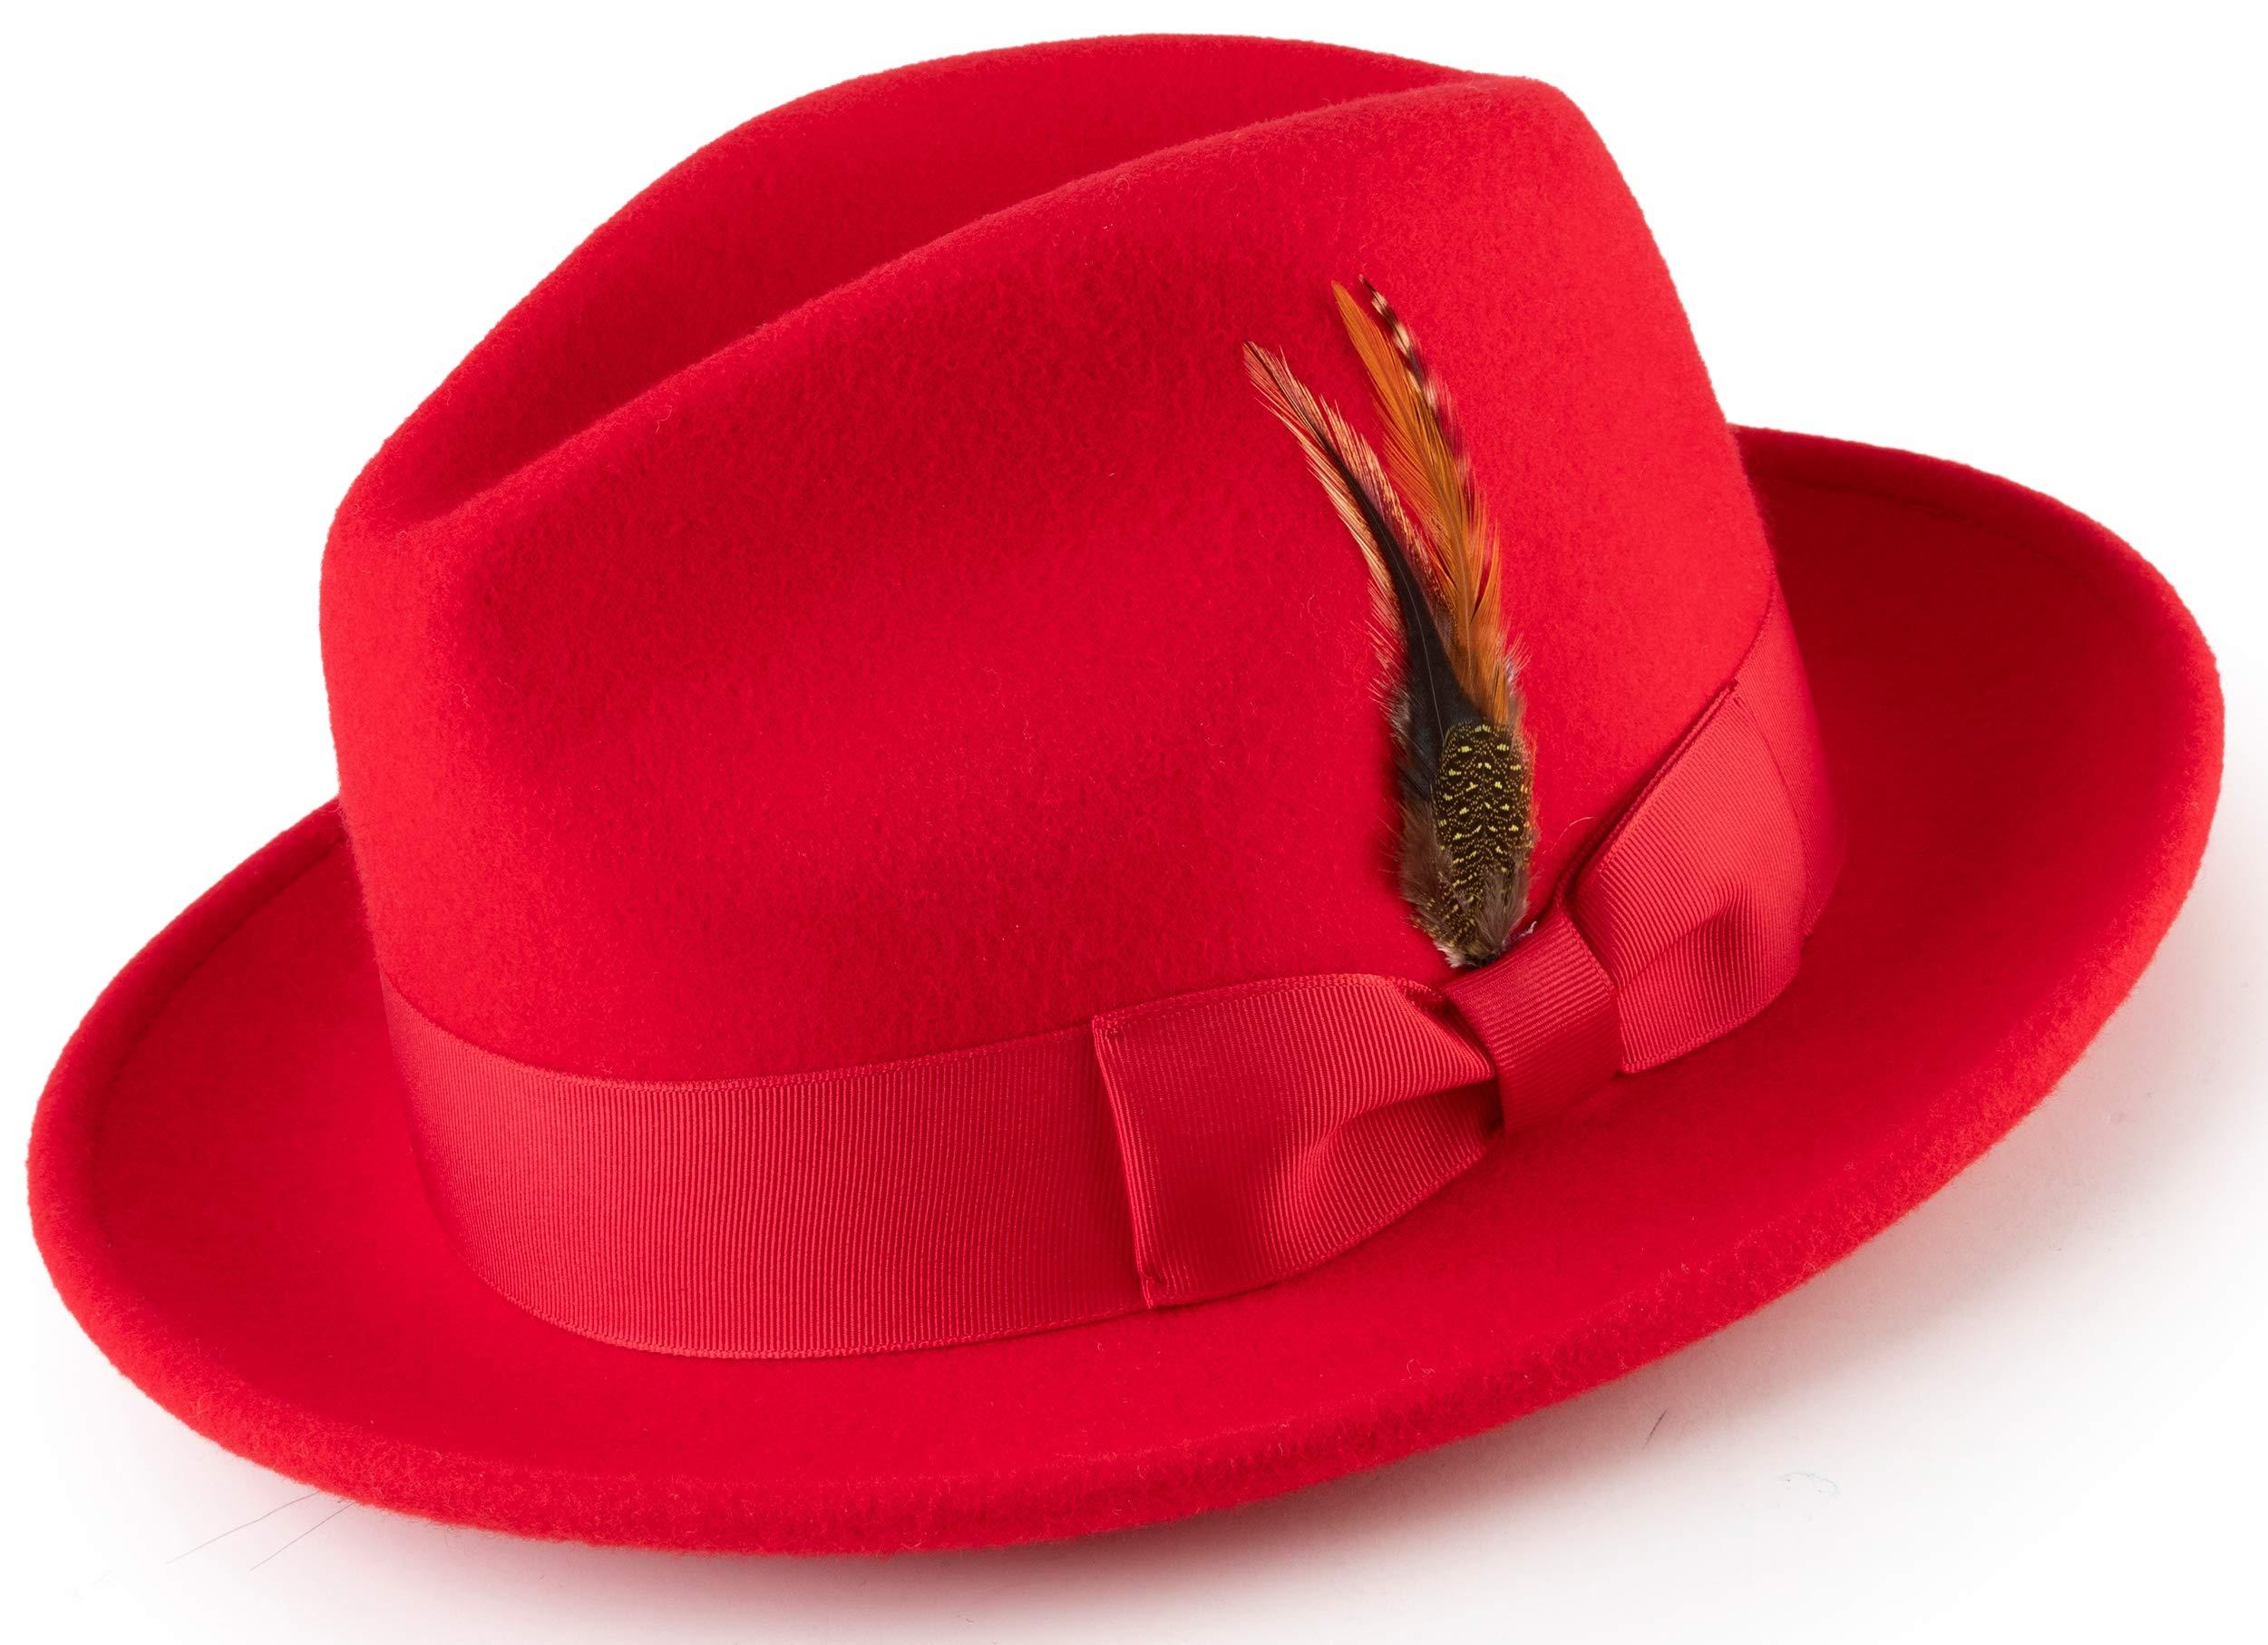 609afdcfbc1d2 MONTIQUE Long Lasting Lightfelt 2 ½ in Wide Brim Wool Felt Dress Hat Men  H-60 (Large